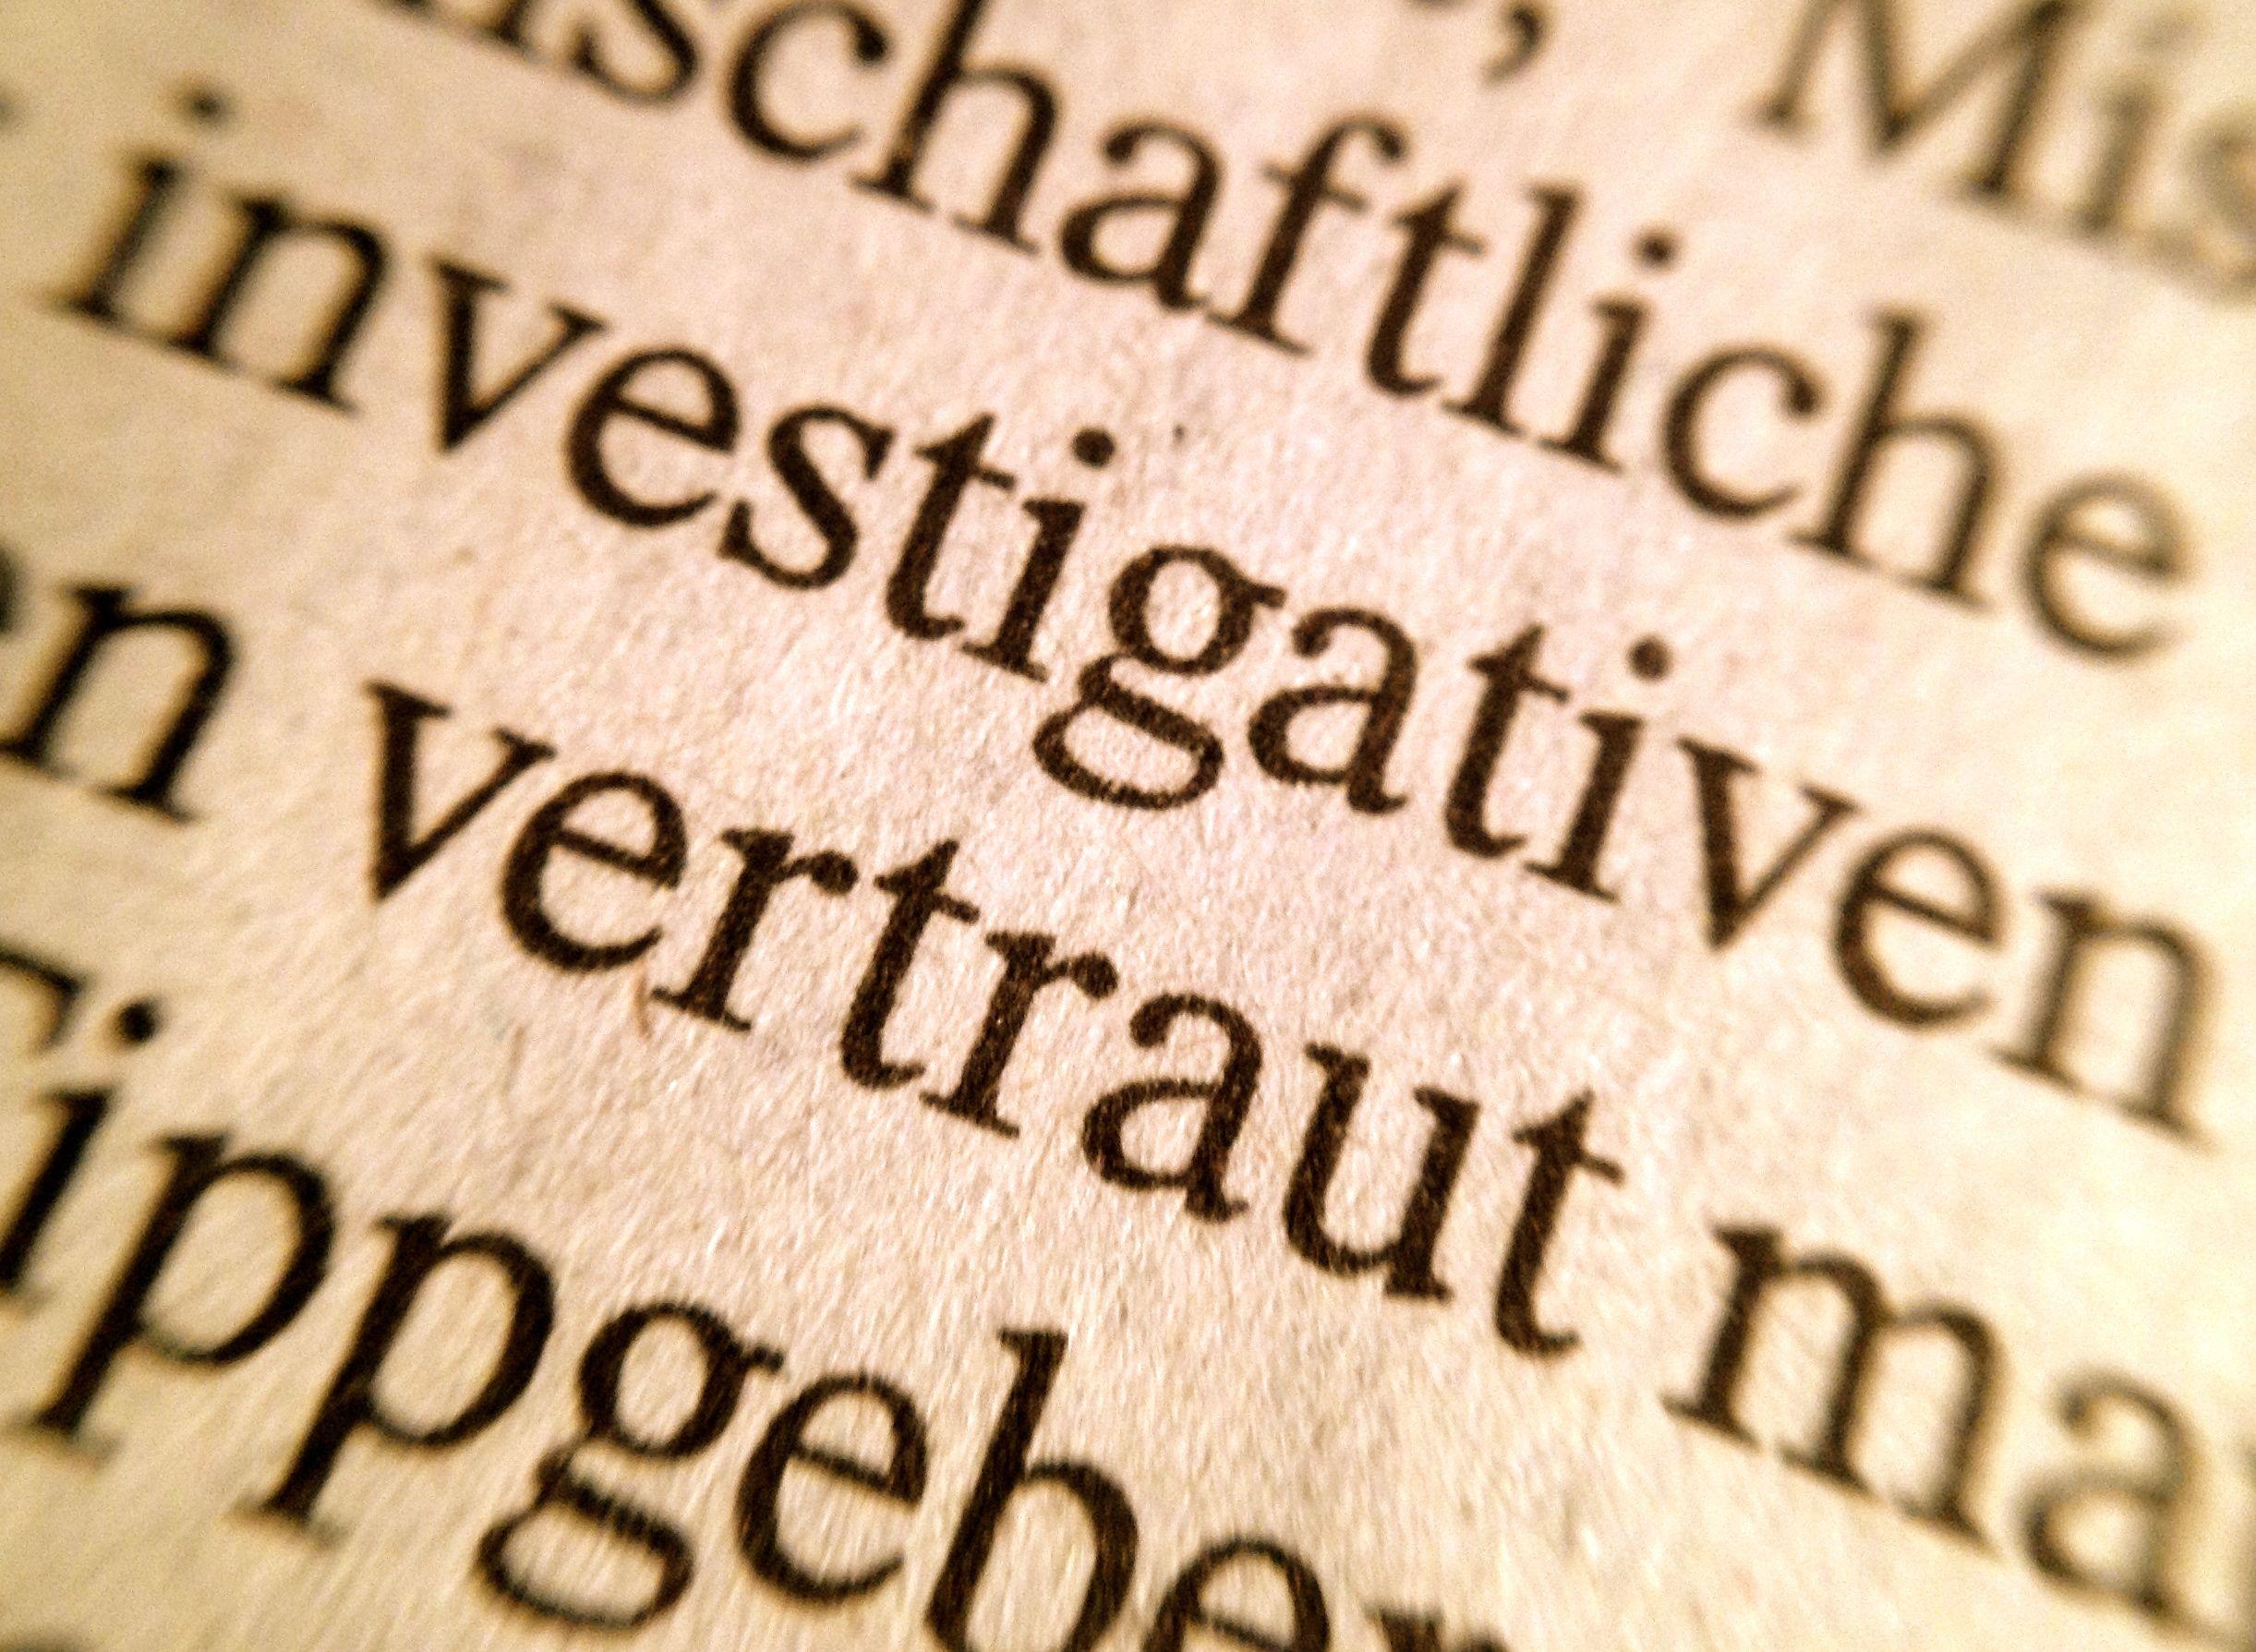 investigativvertraut